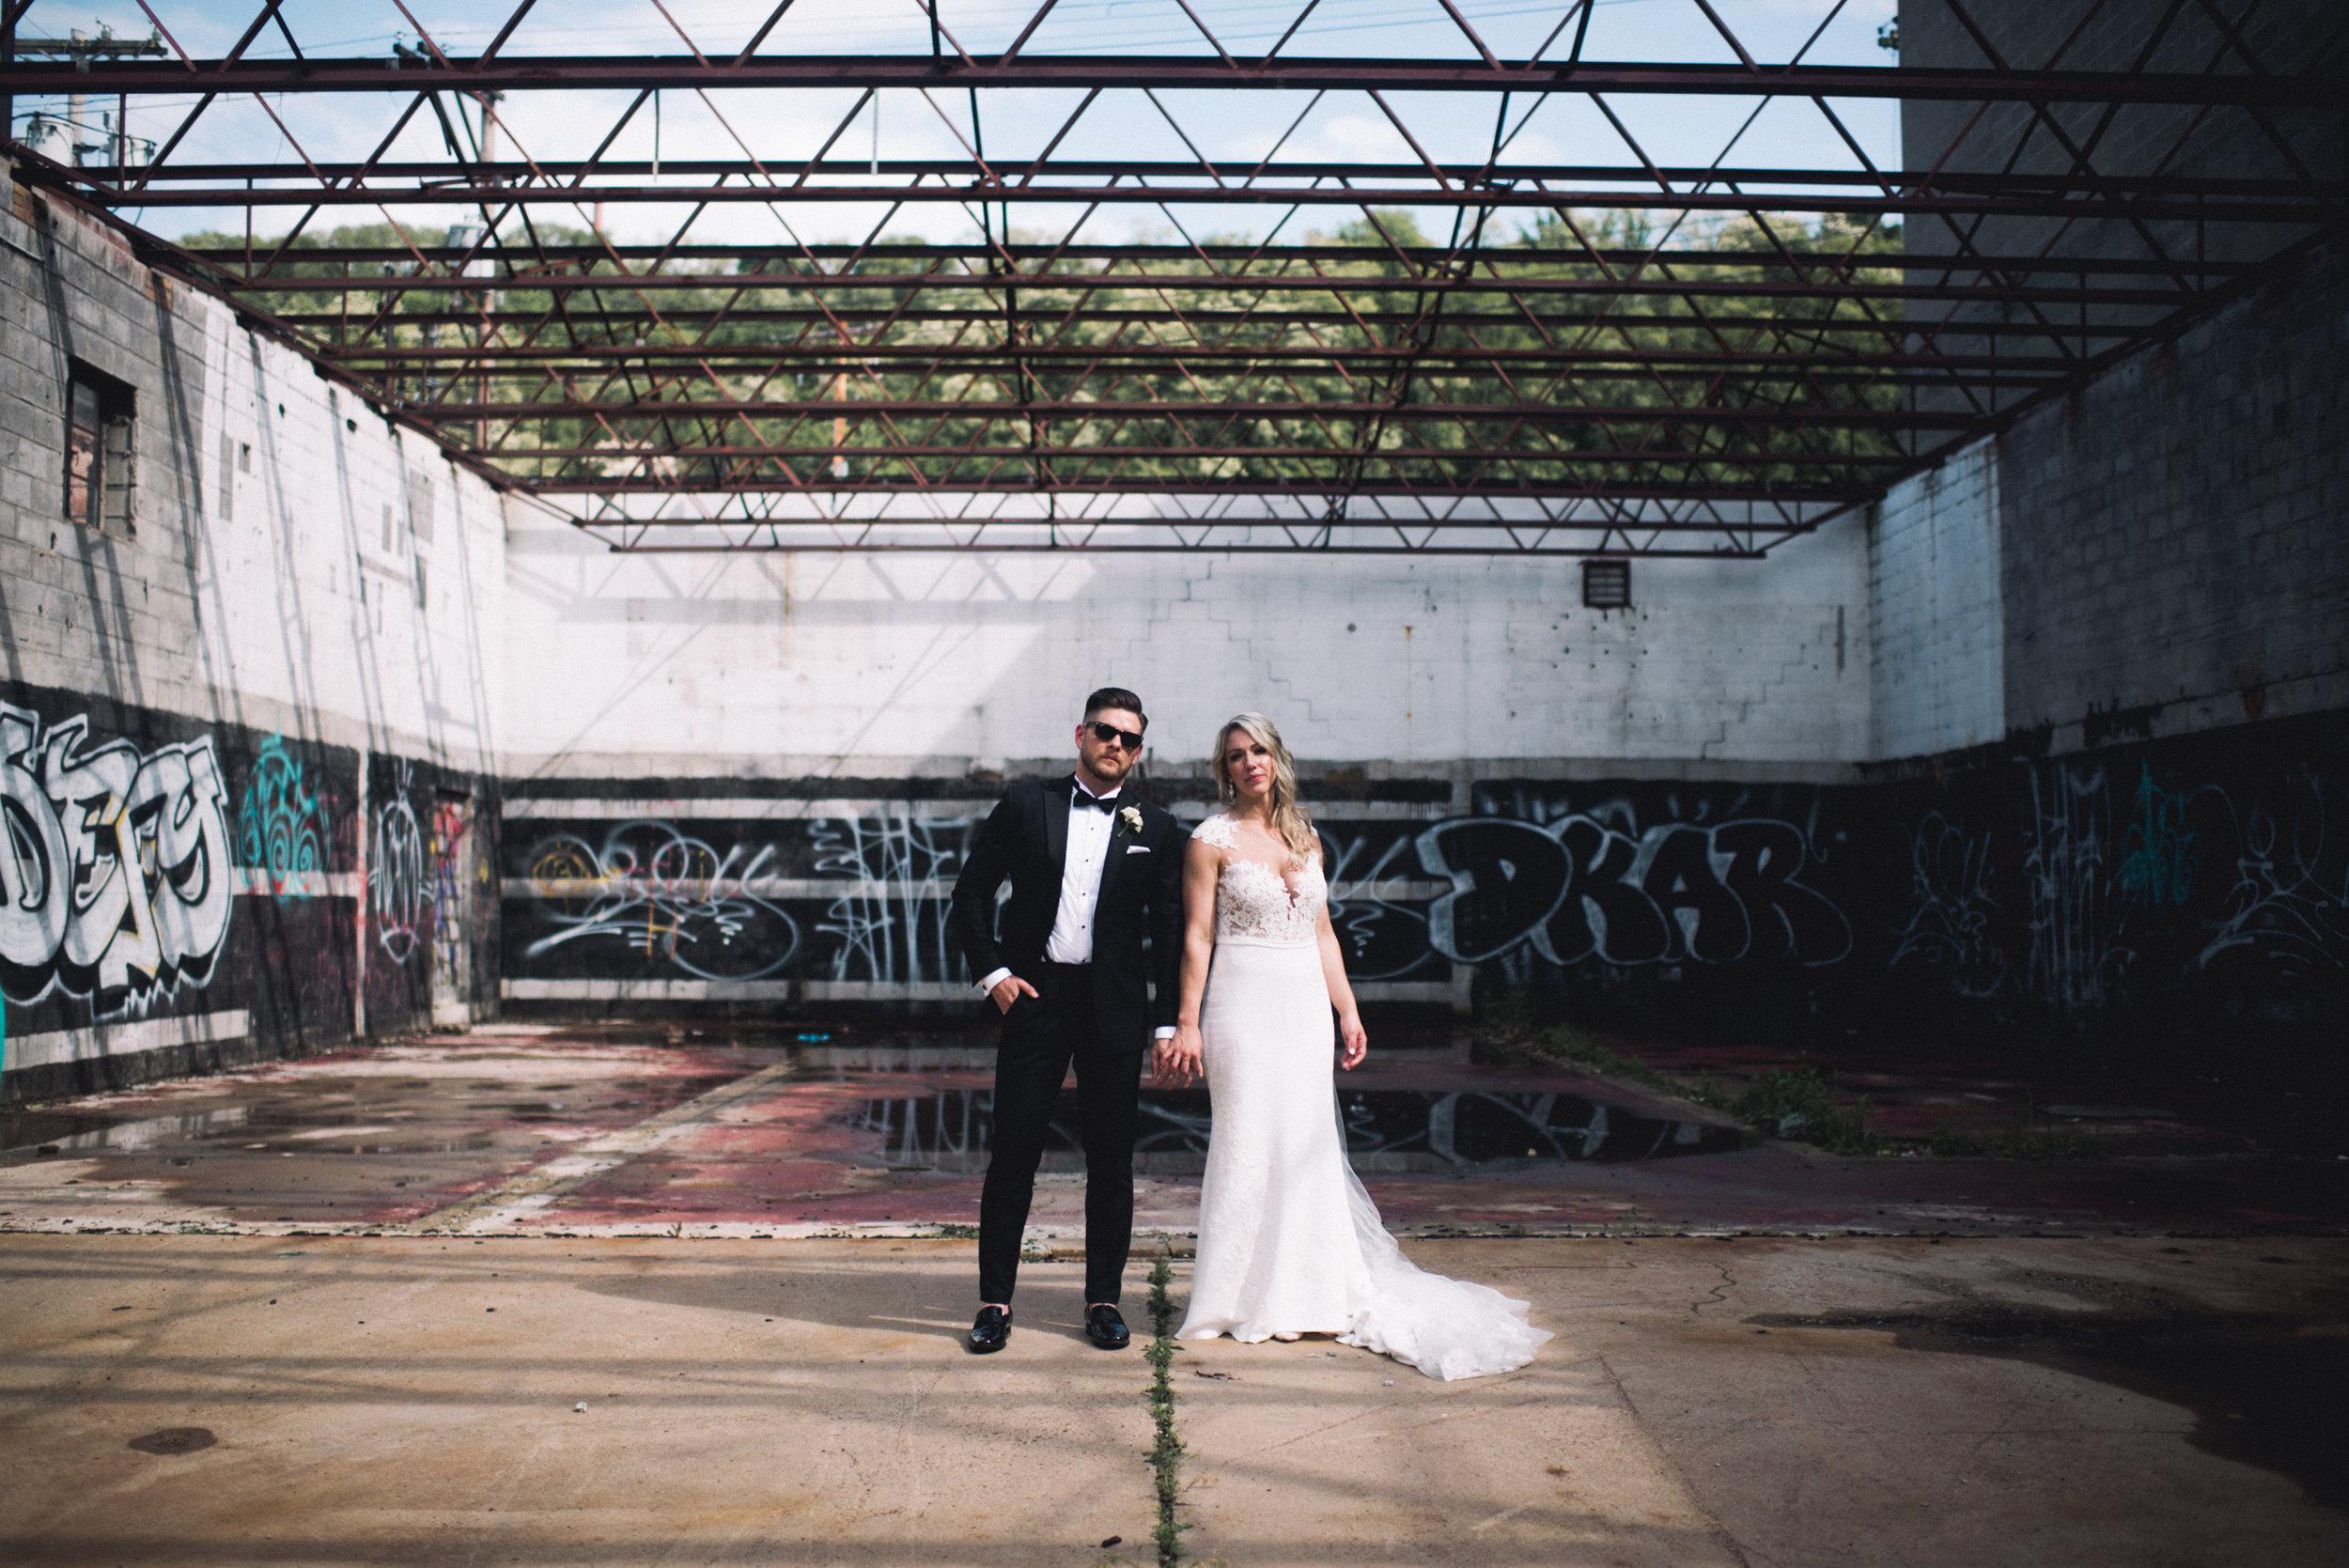 Pittsburgh Pennsylvania New York NYC Wedding Photographer Photojournalist Luxury Downtown Opera - Stirpe 1082.jpg